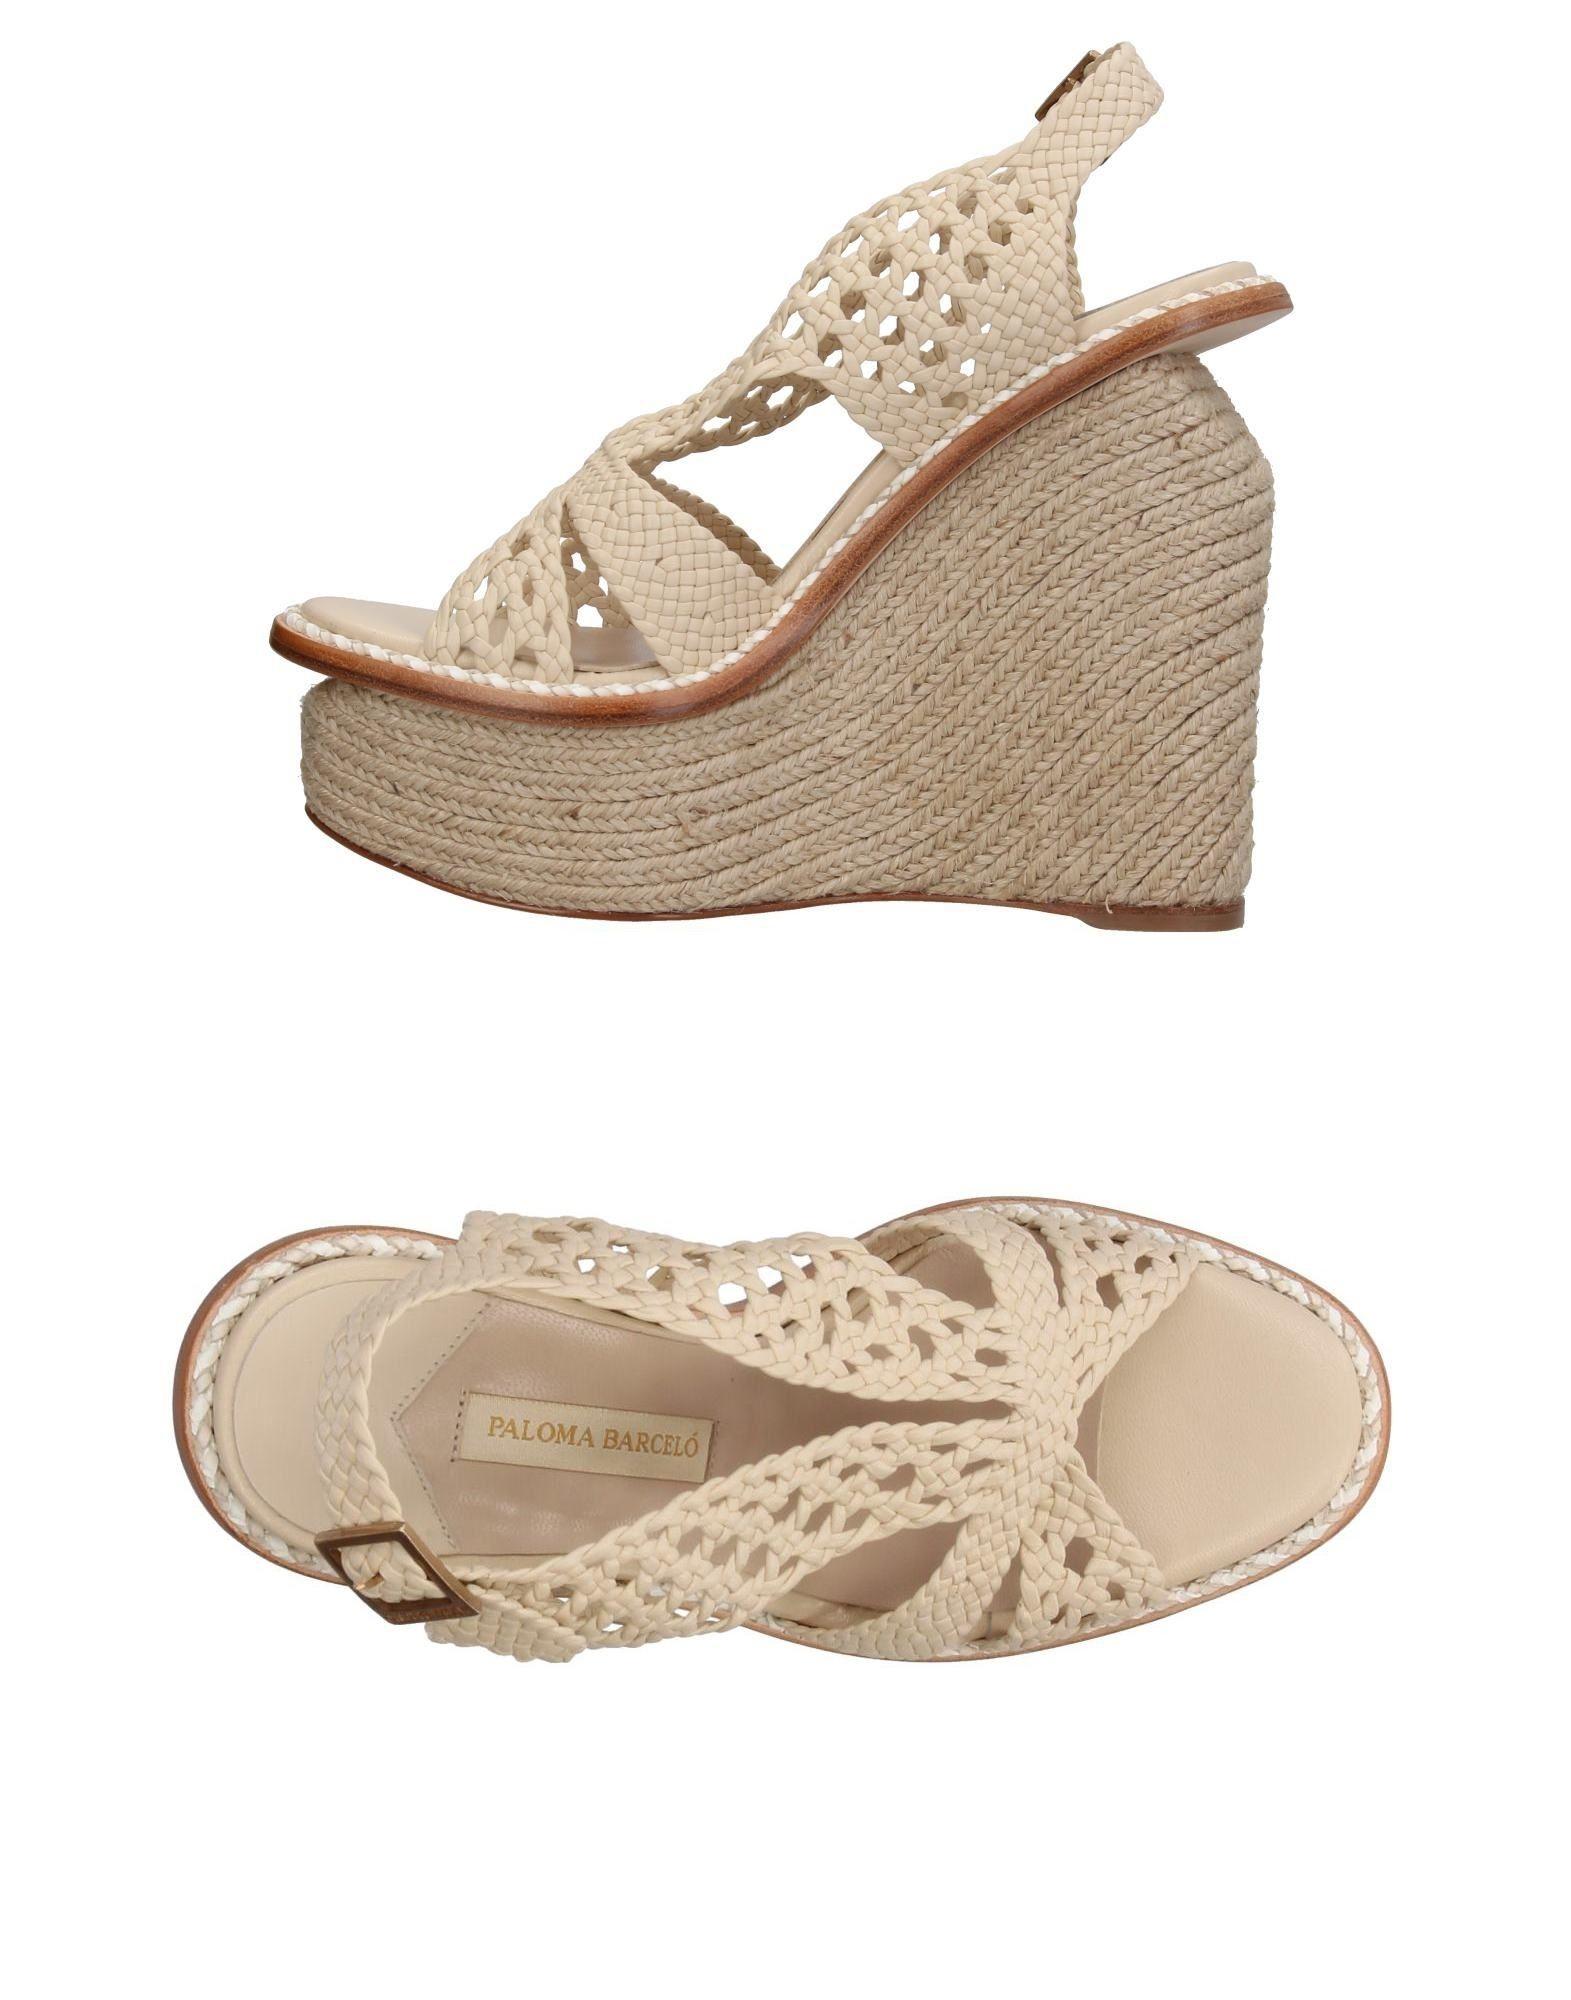 Paloma Paloma Paloma Barceló Sandalen Damen  11383833MD Gute Qualität beliebte Schuhe c4d8a4